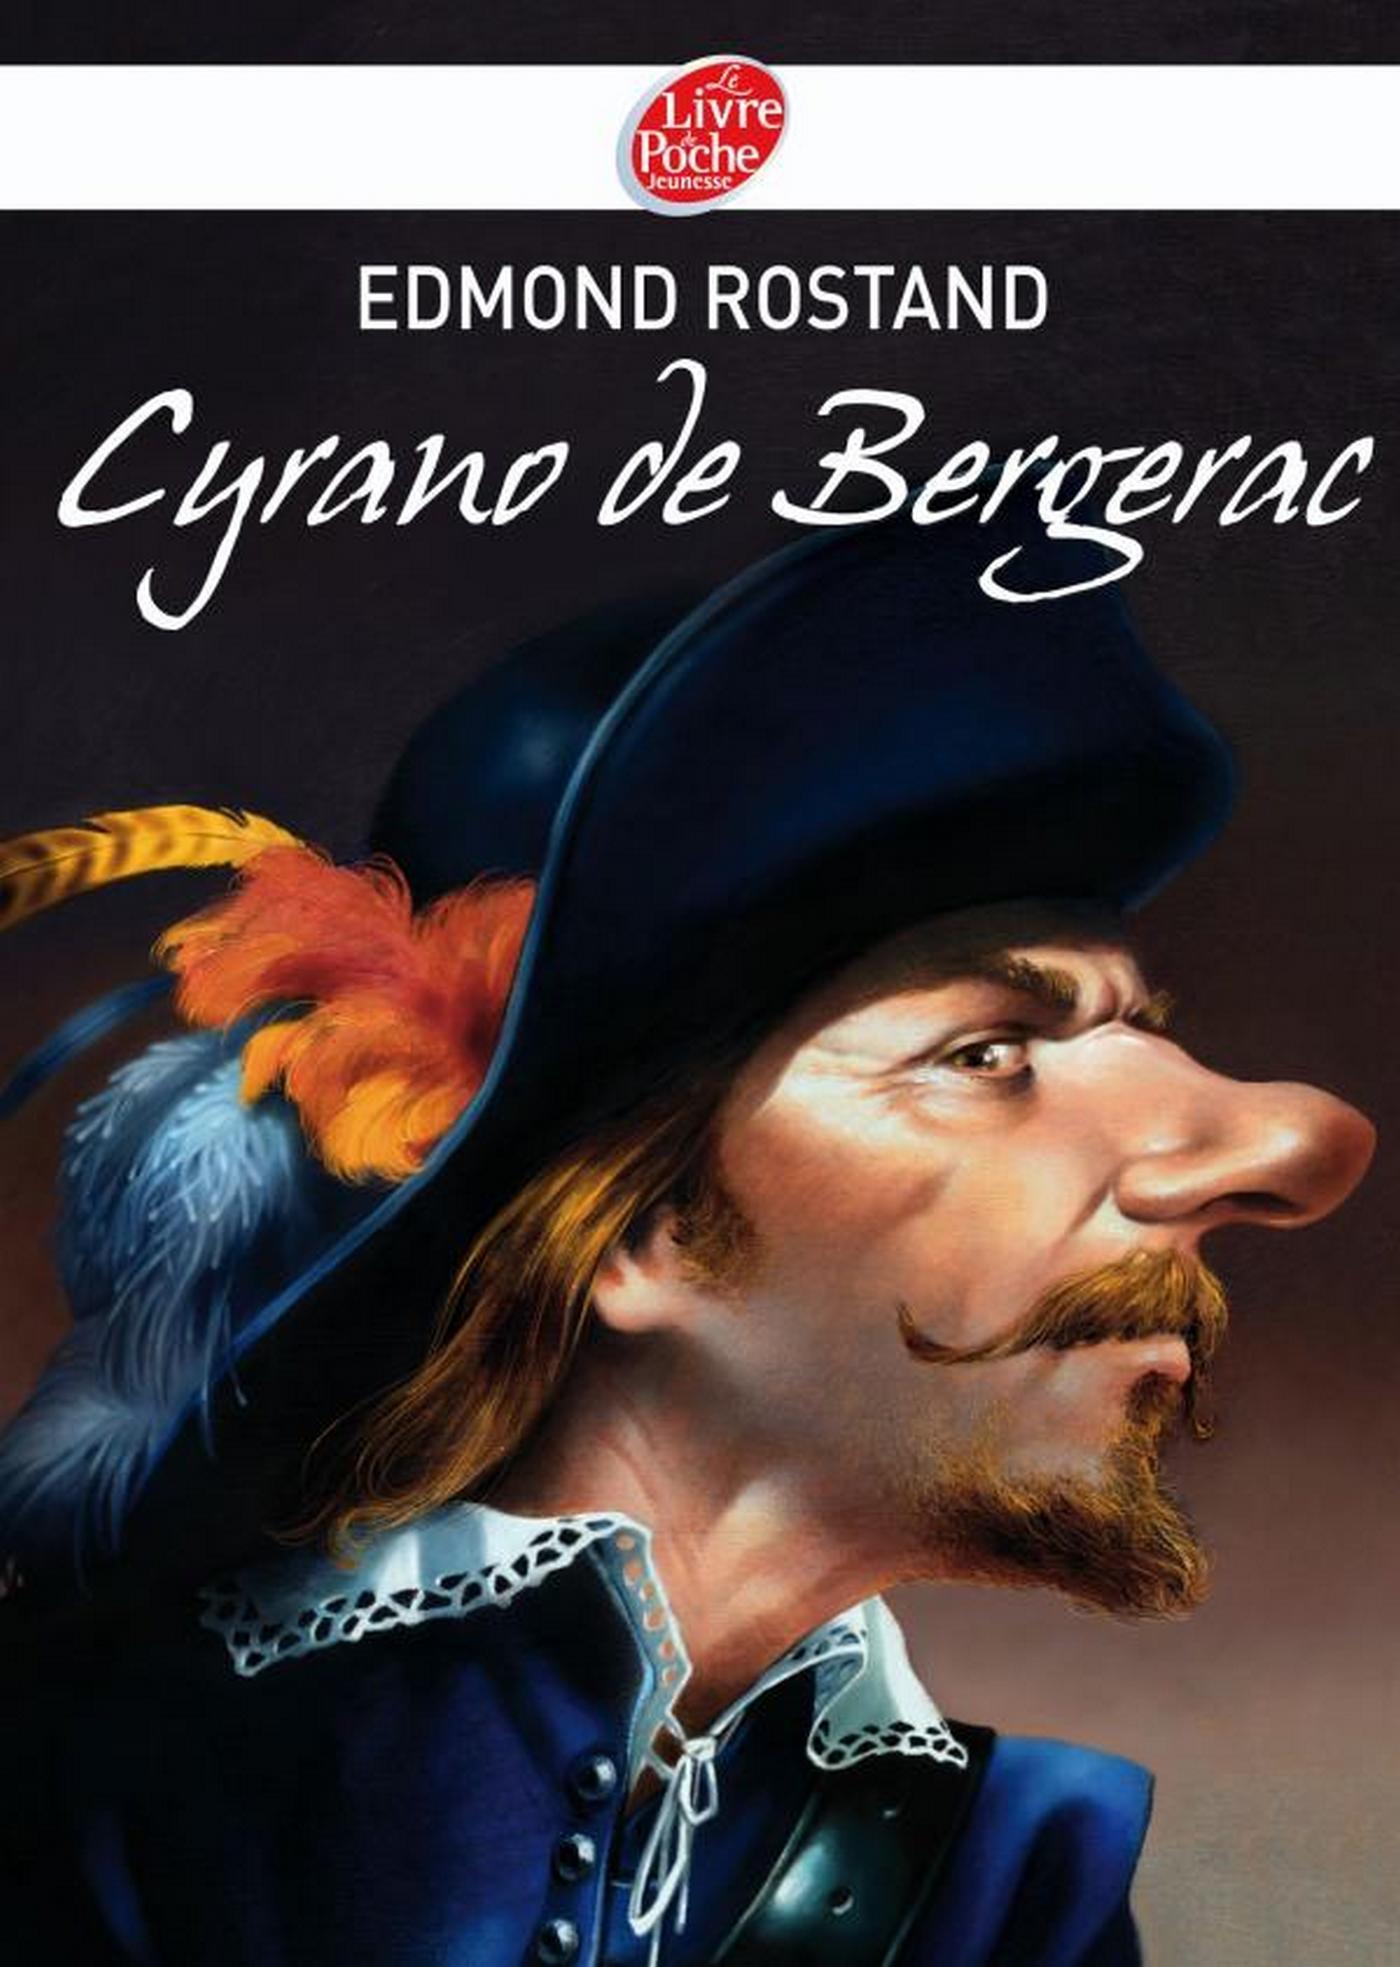 Daftar Cameo datovania agentúra Cyrano pripojiť Shepparton